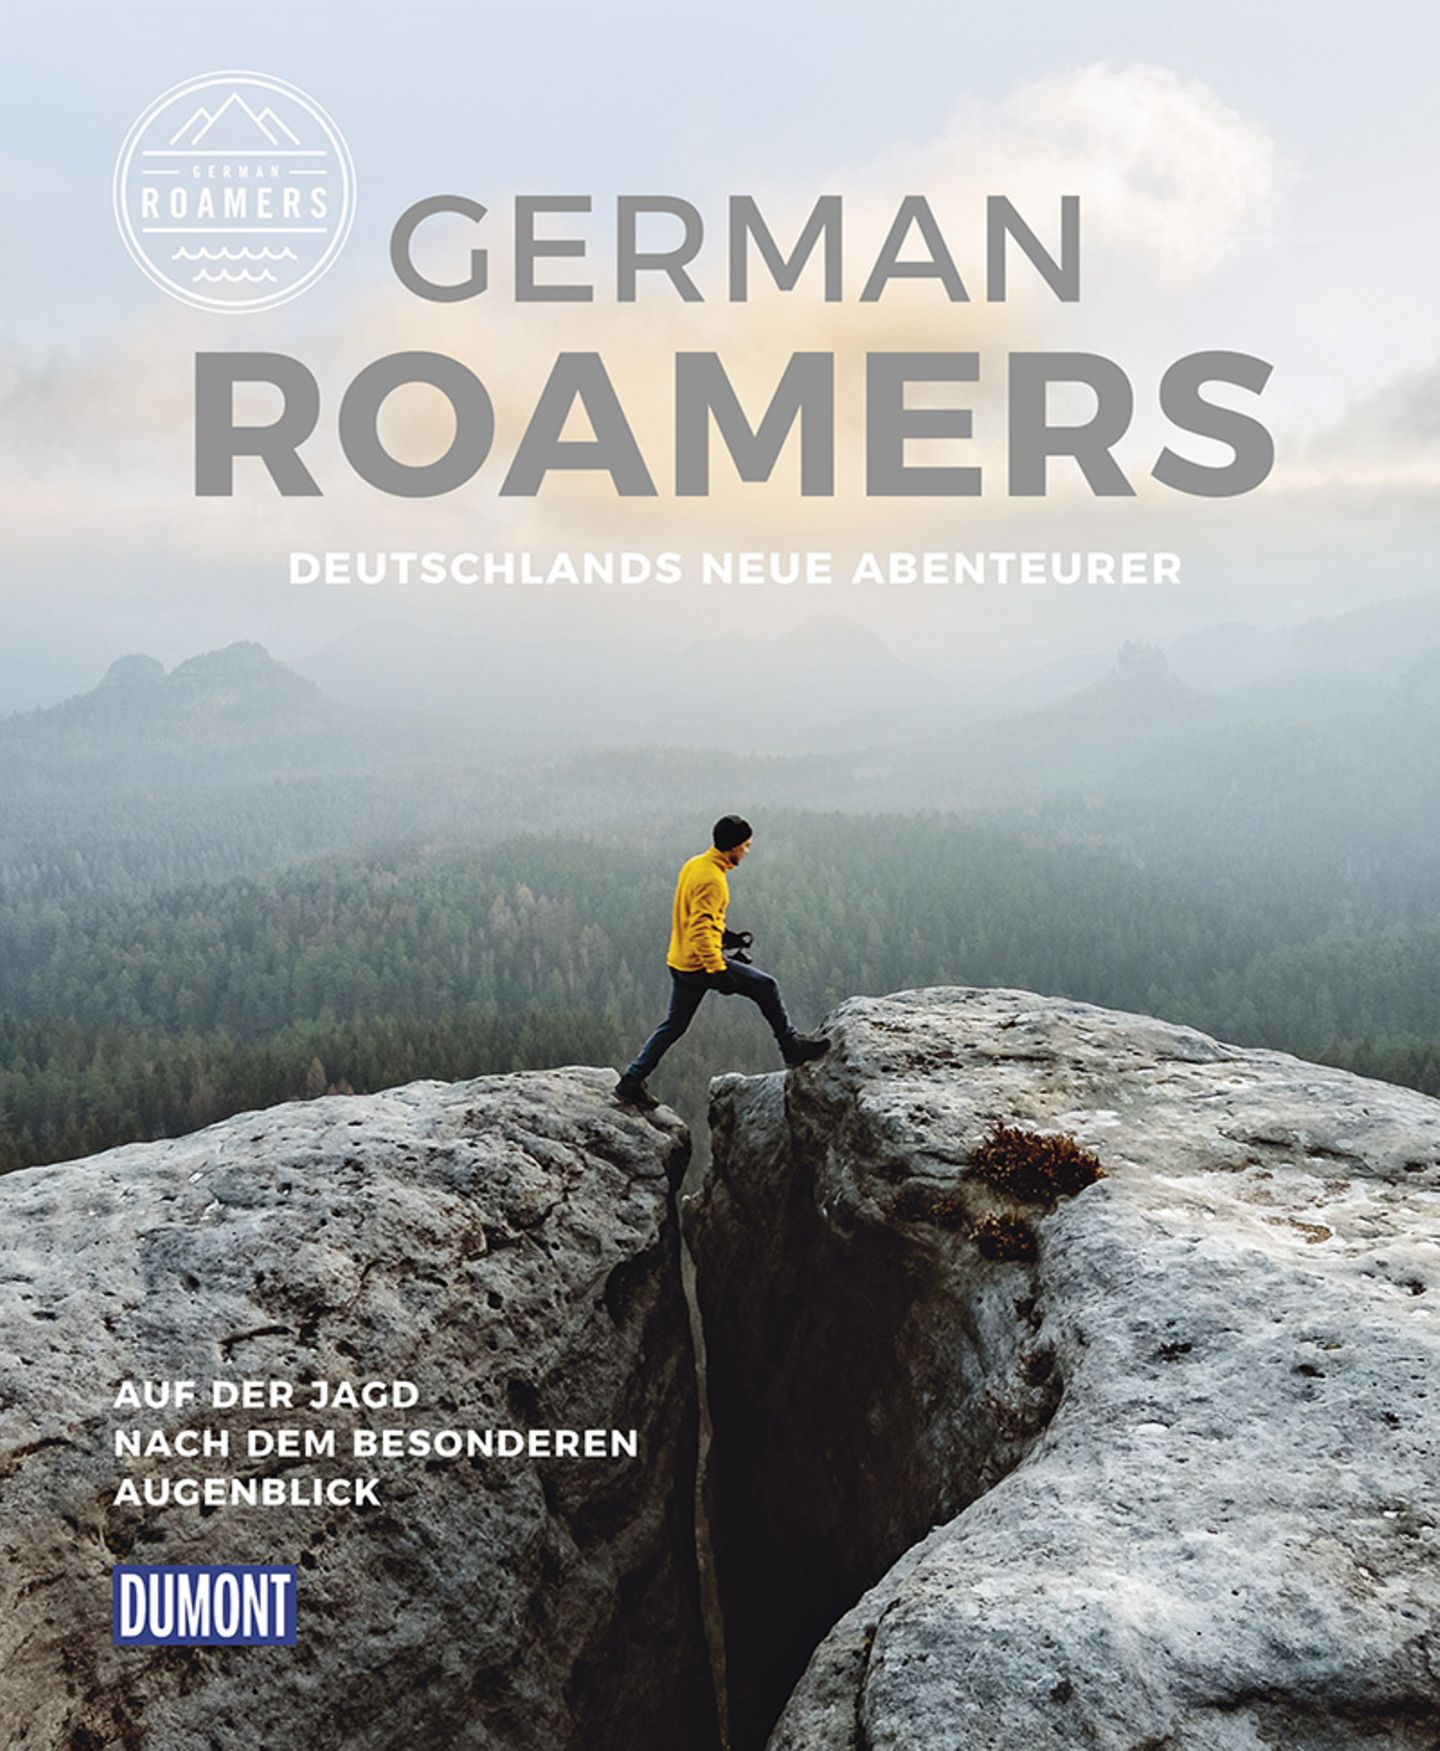 Buchcover German Roamers